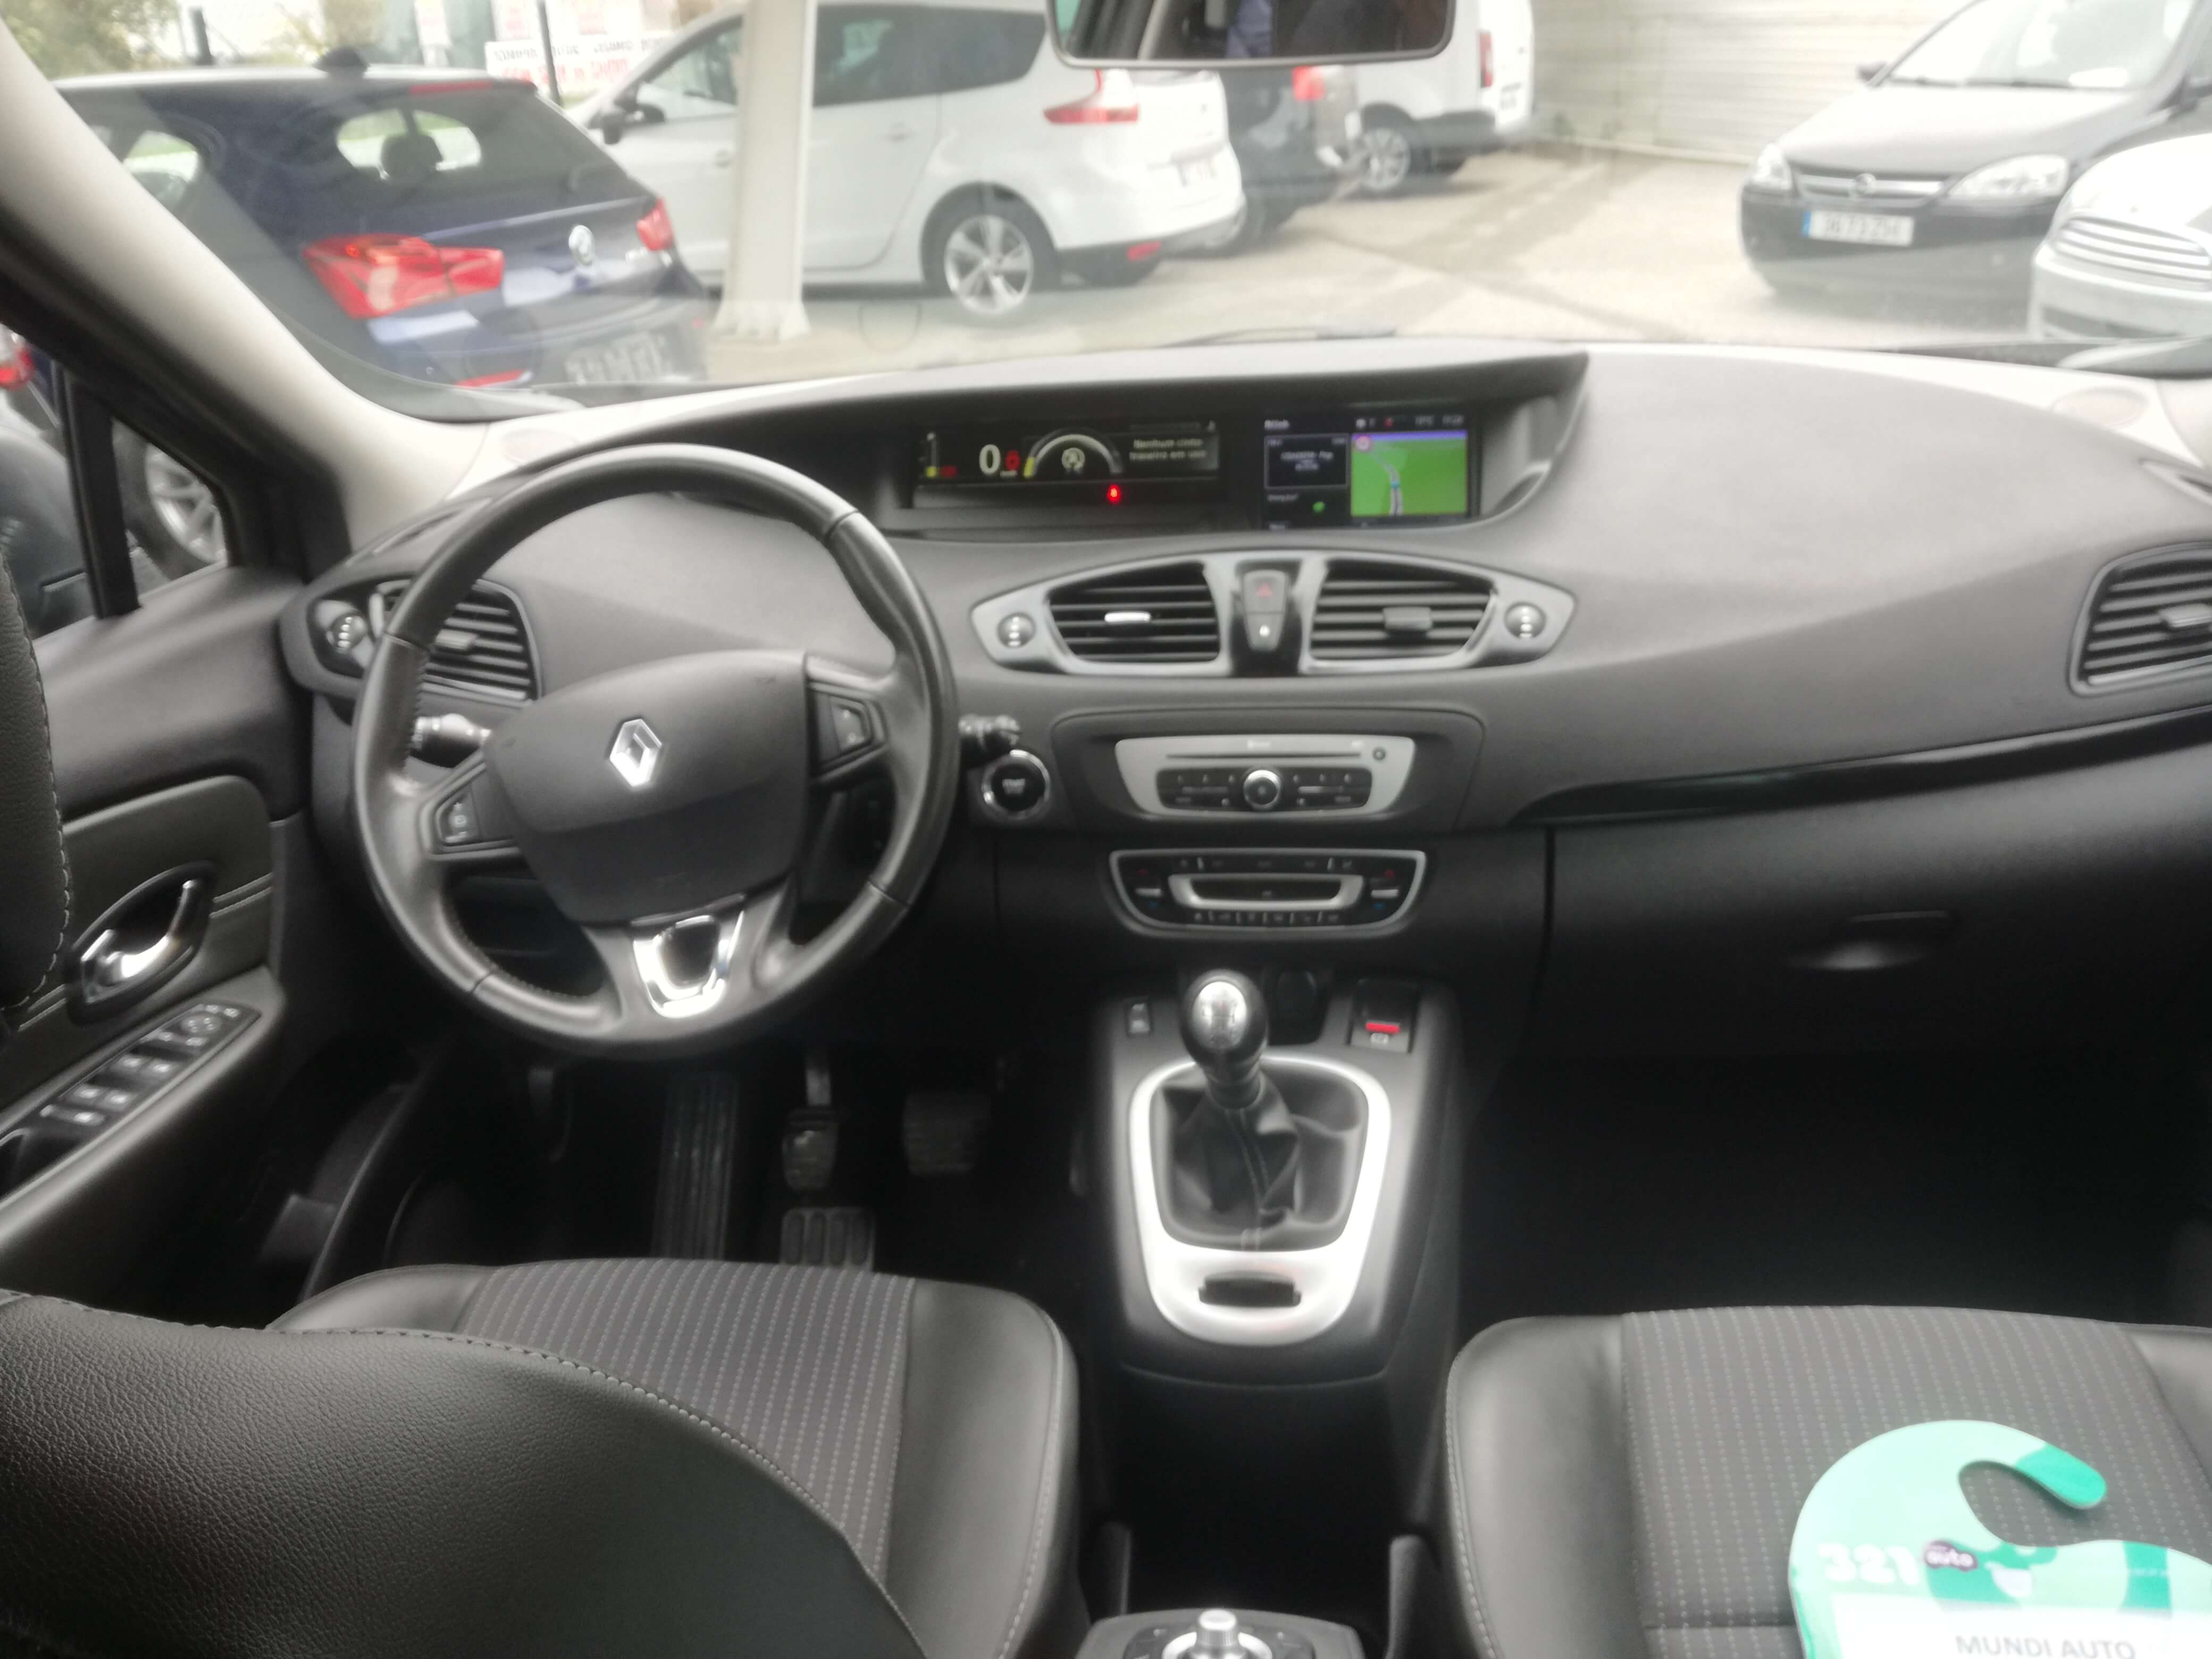 Renault Grand Scenic 1.5 DCI 110 LIMITED | Imagem 11